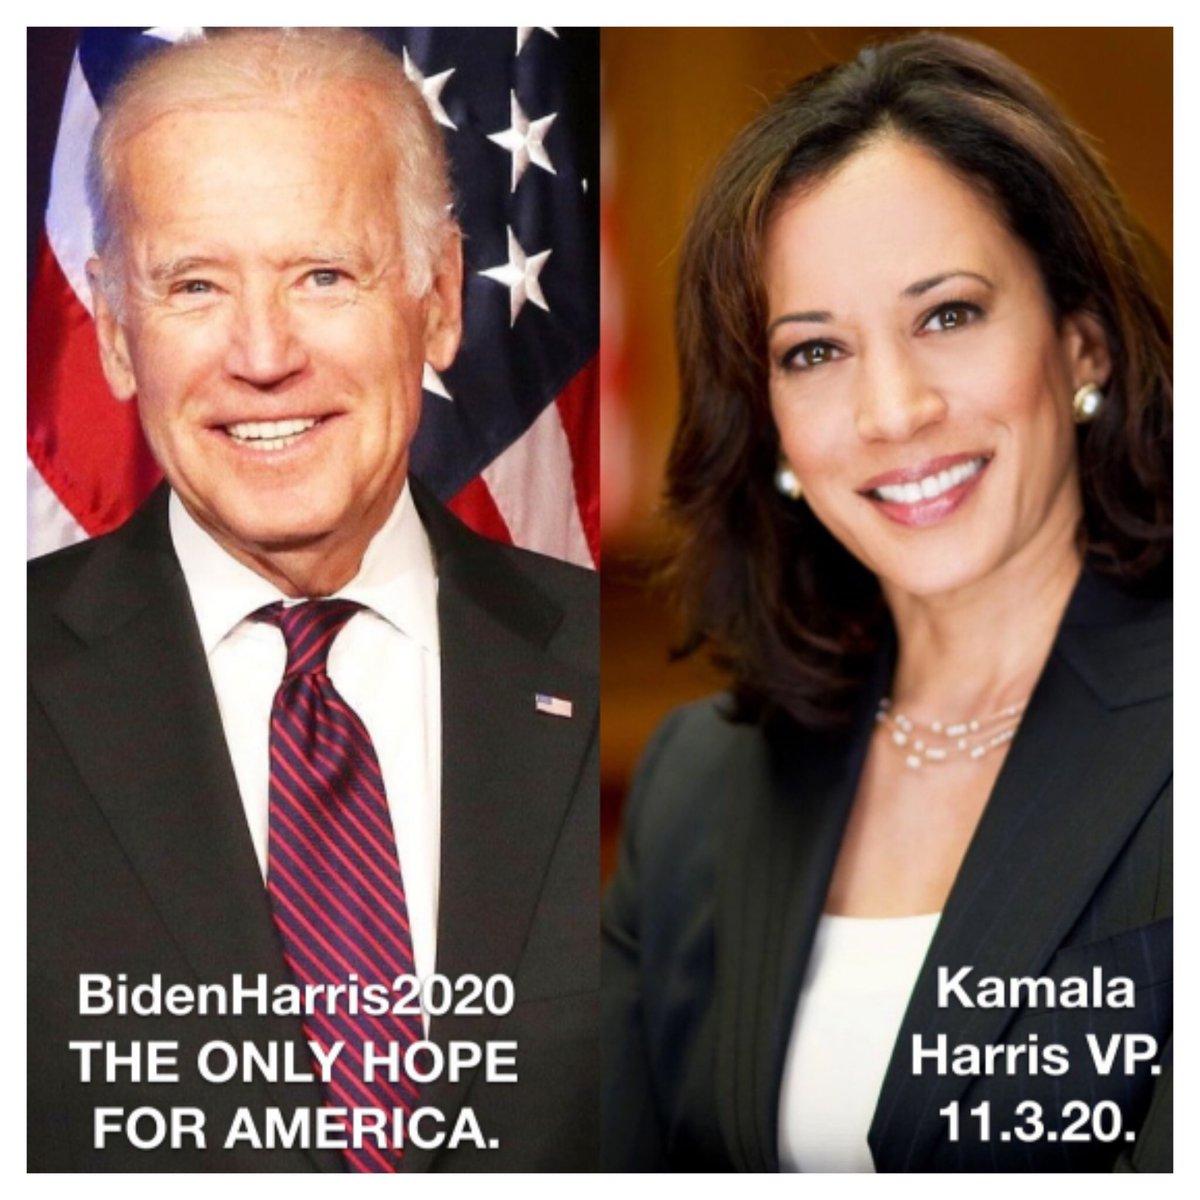 #BidenHarrisToSaveAmerica twitter.com/funder/status/…